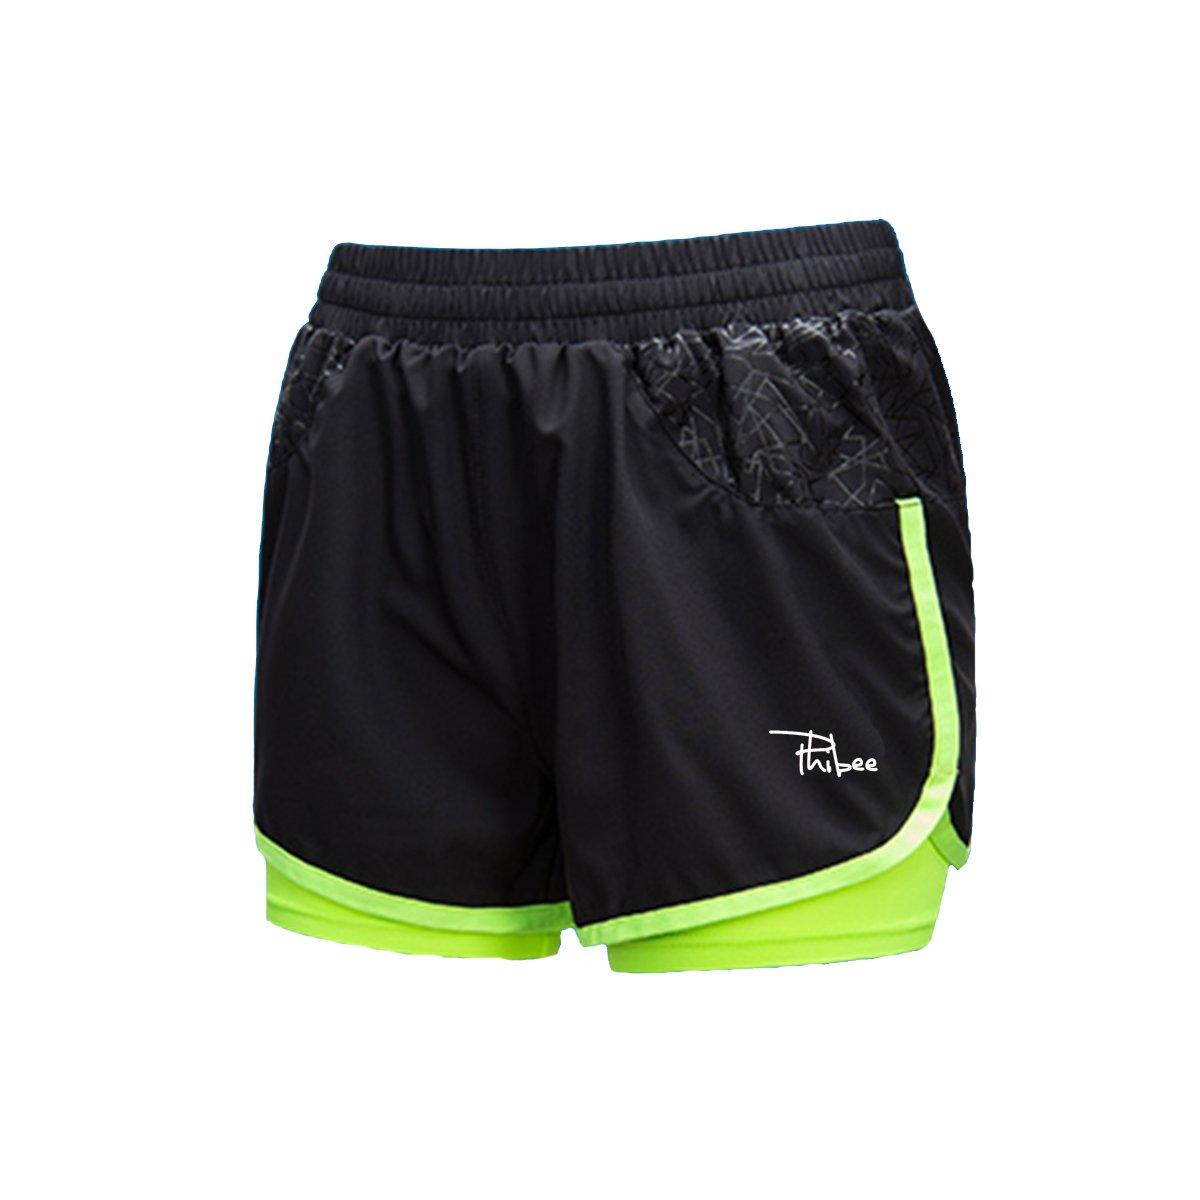 PHIBEE Men's 2-in-1 Running Shorts Elasticity Lightweight Sweatpants